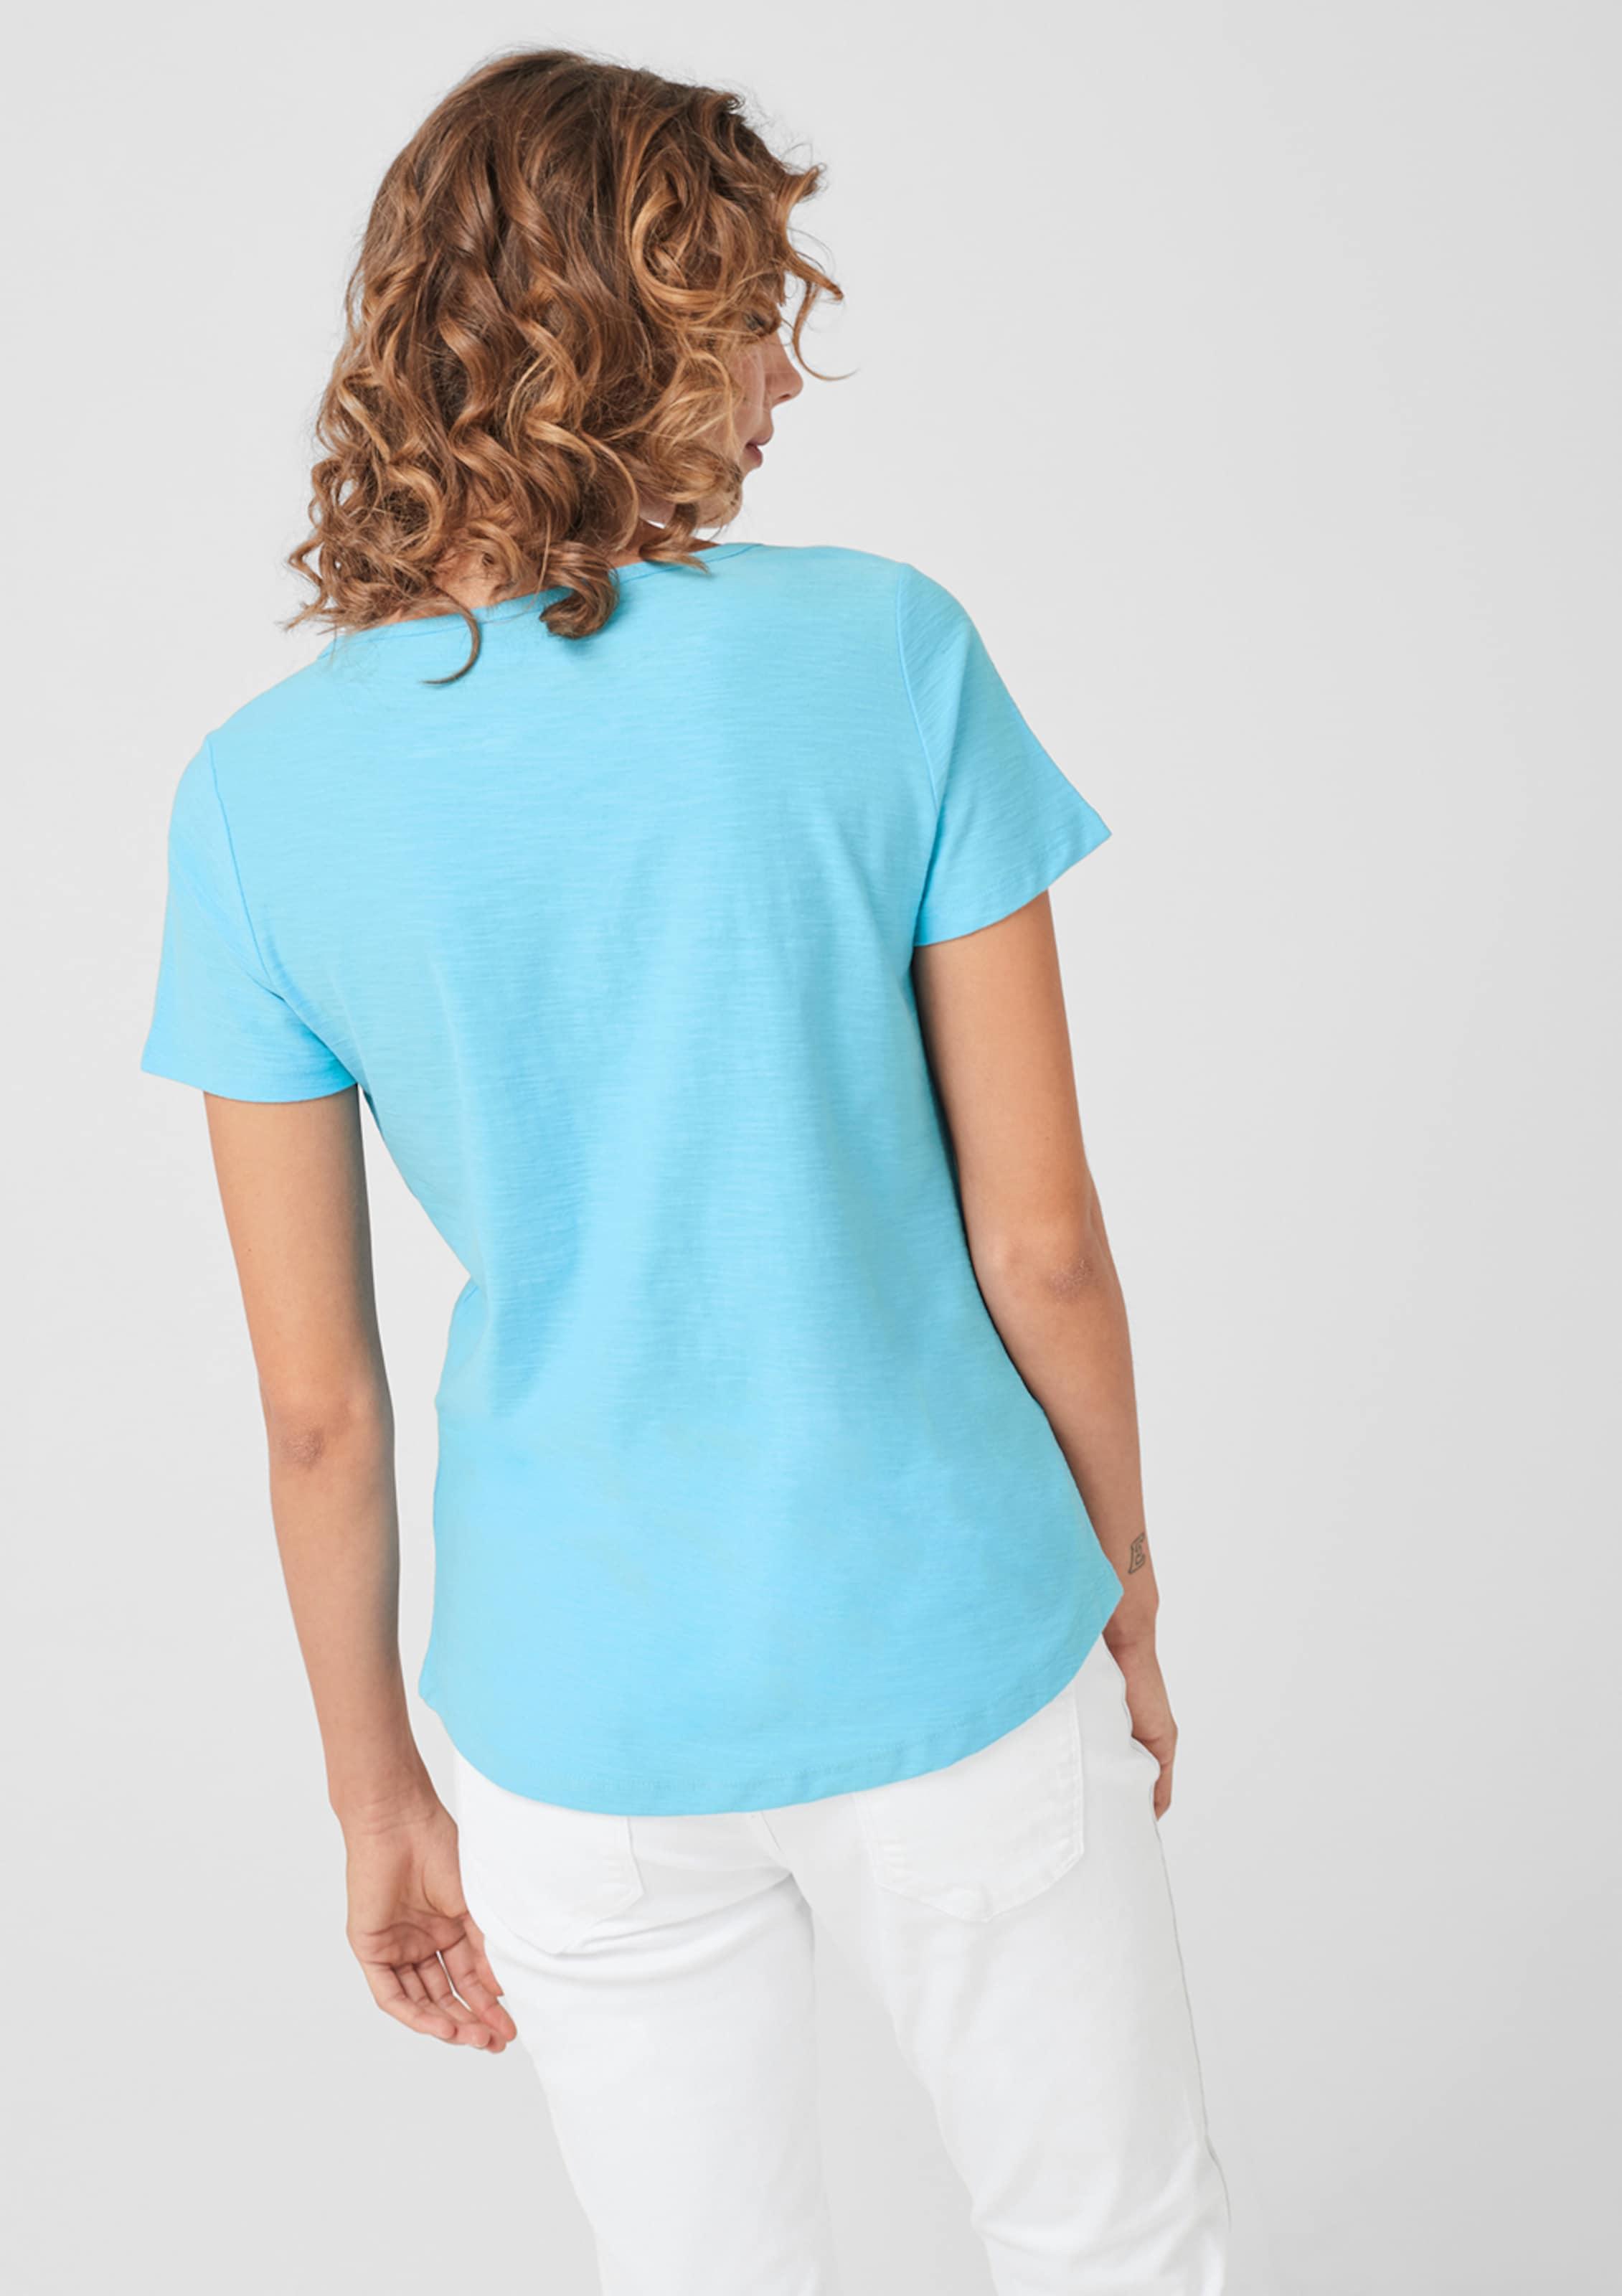 S In oliver Red Hellblau Label Shirt 3AjRc54qL